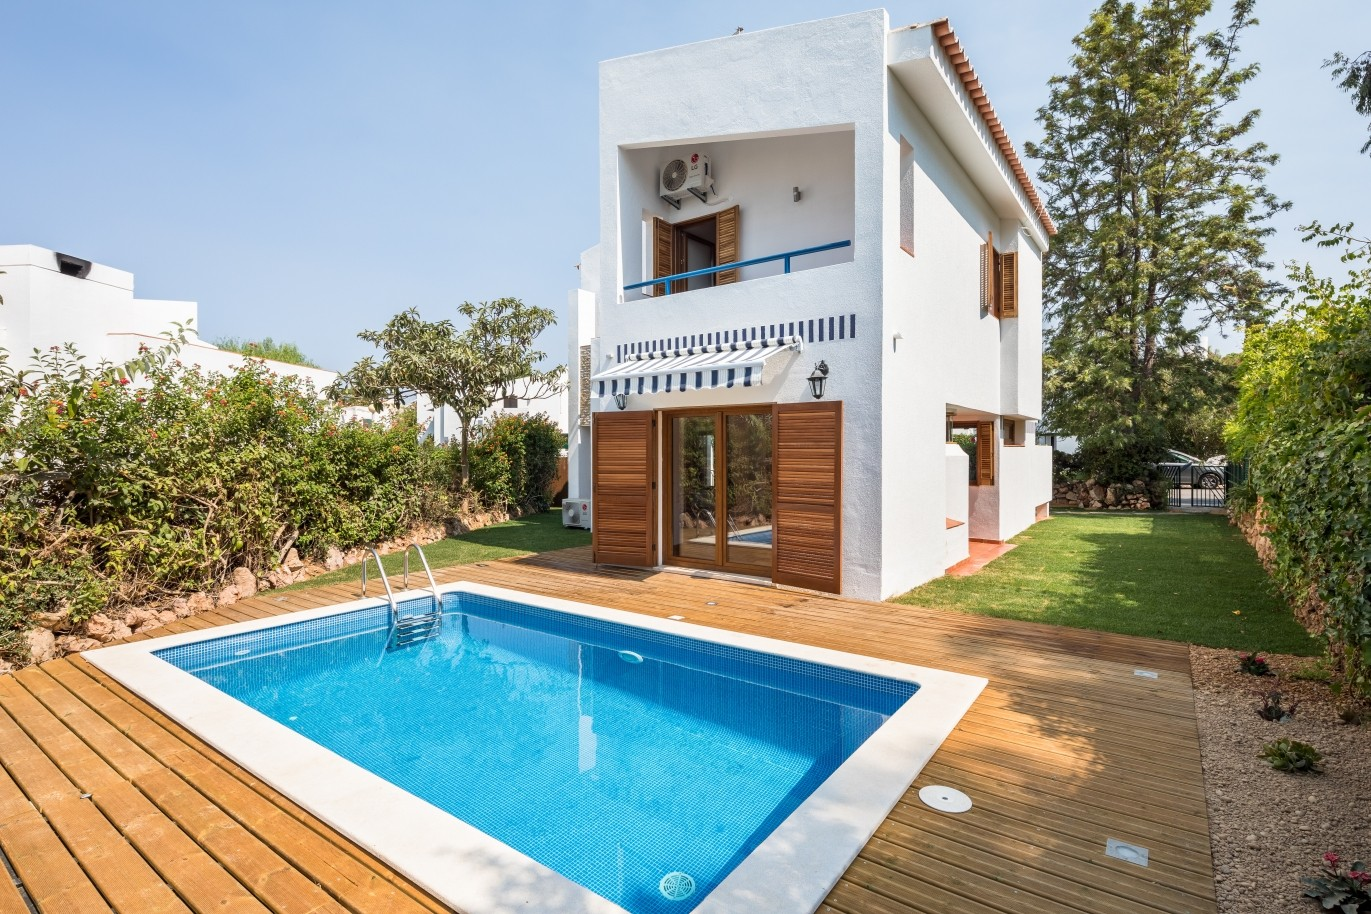 villa-with-terrace-garden-and-pool-vilamoura-algarve-portugal